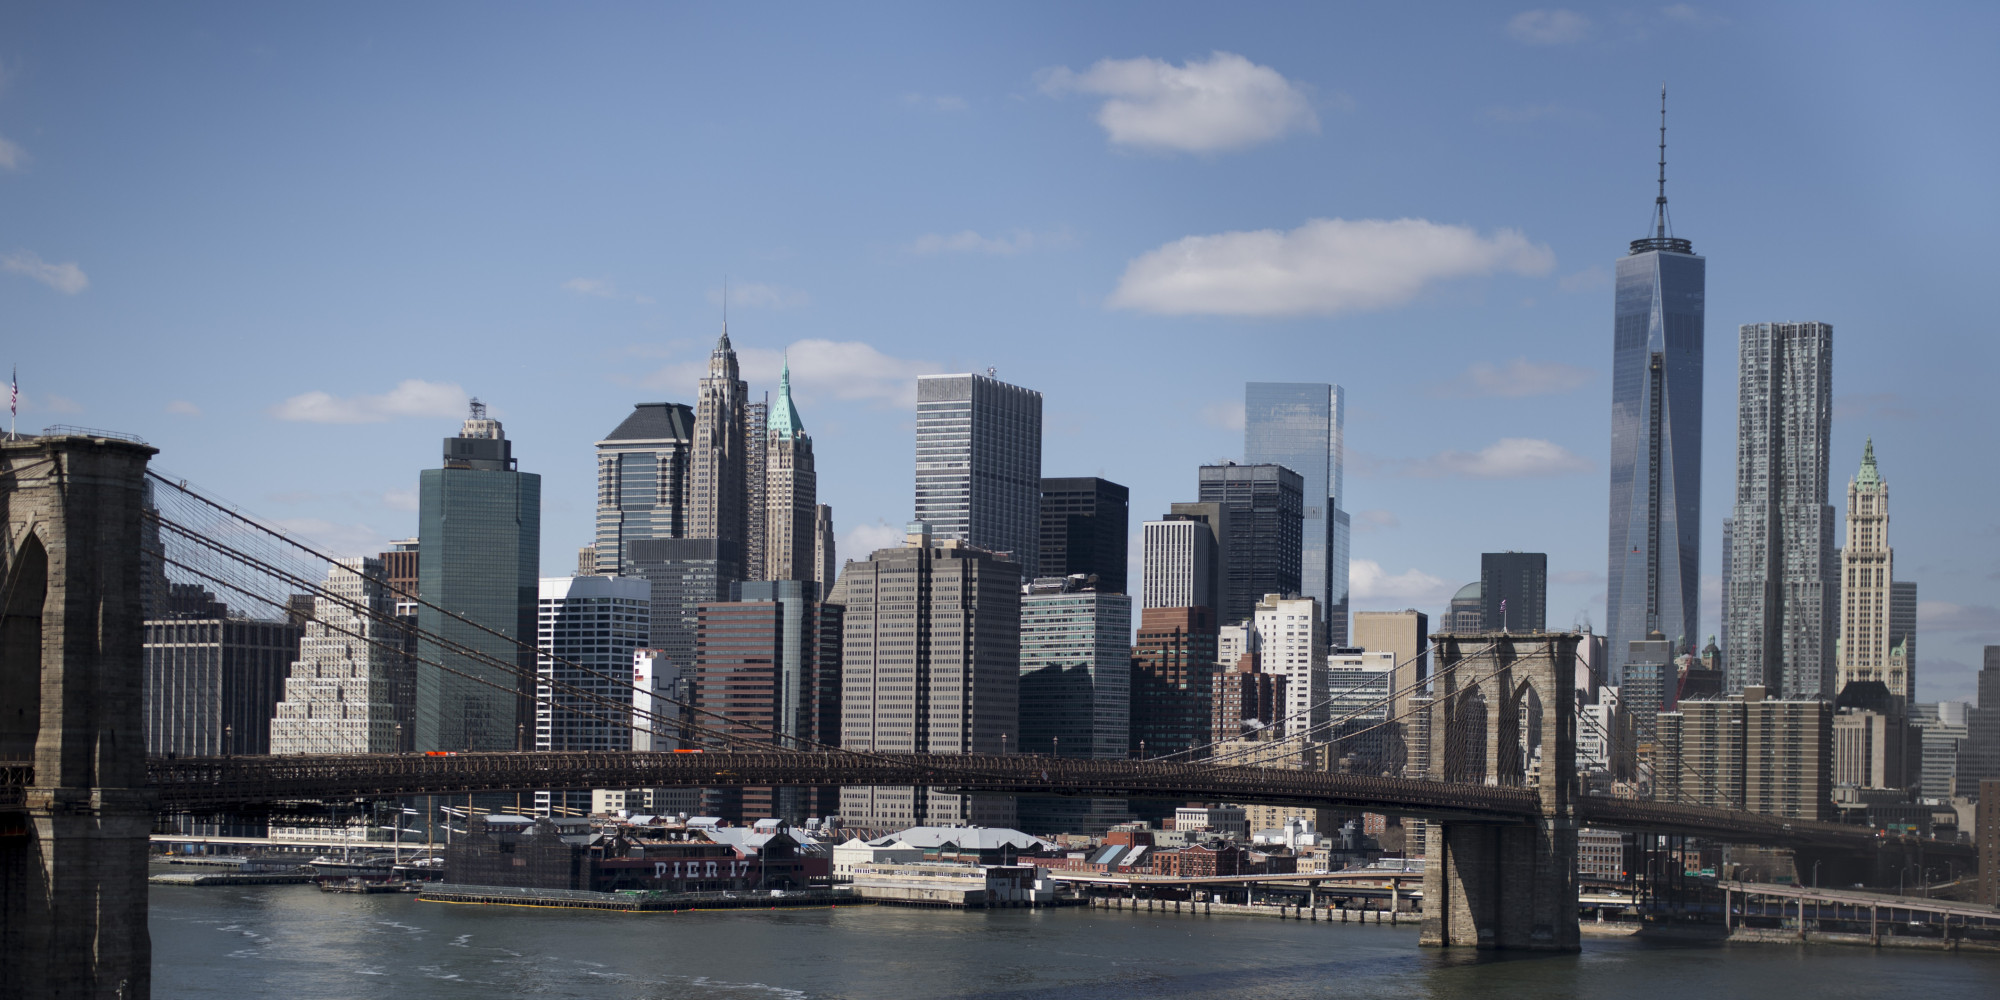 york city skyline day - photo #4